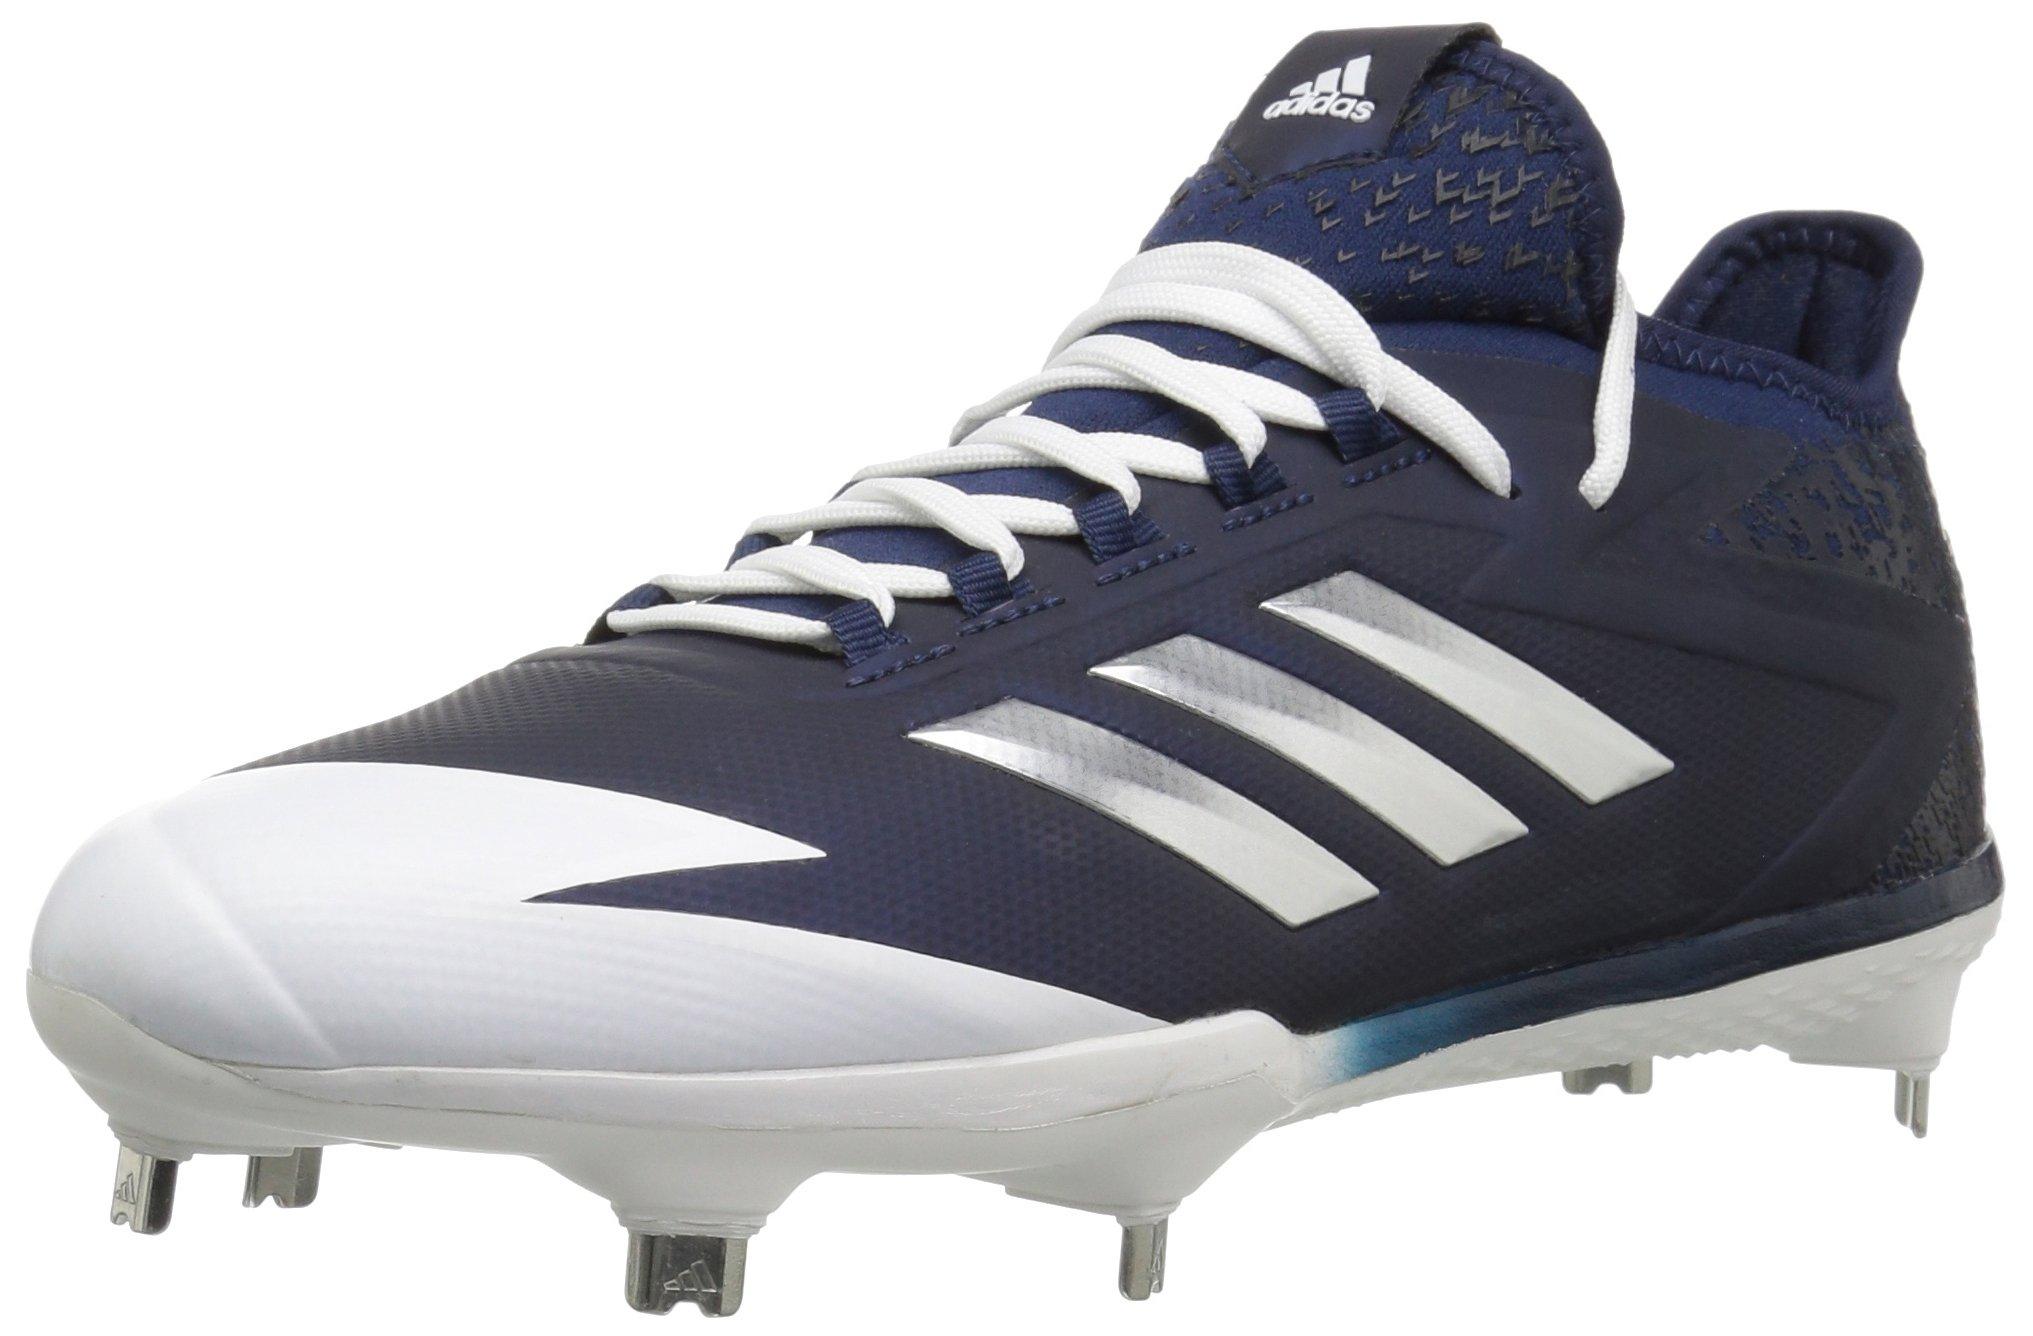 adidas Men's Freak X Carbon Mid Baseball Shoe, Collegiate Navy, Silver Met, FTWR White, 7 M US